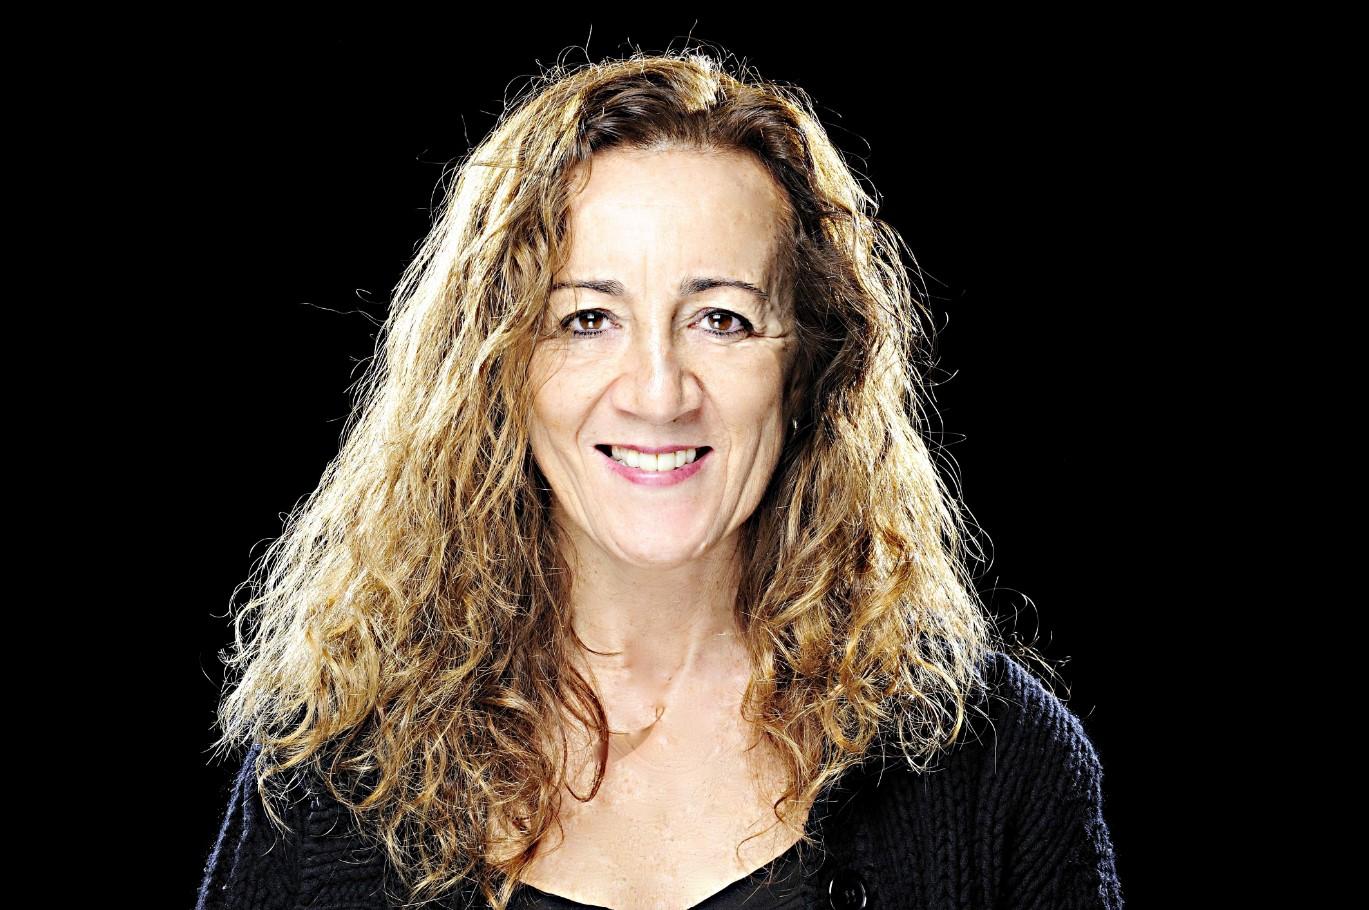 Foto de Carme Portaceli, nueva directora artística del Teatre Nacional de Catalunya